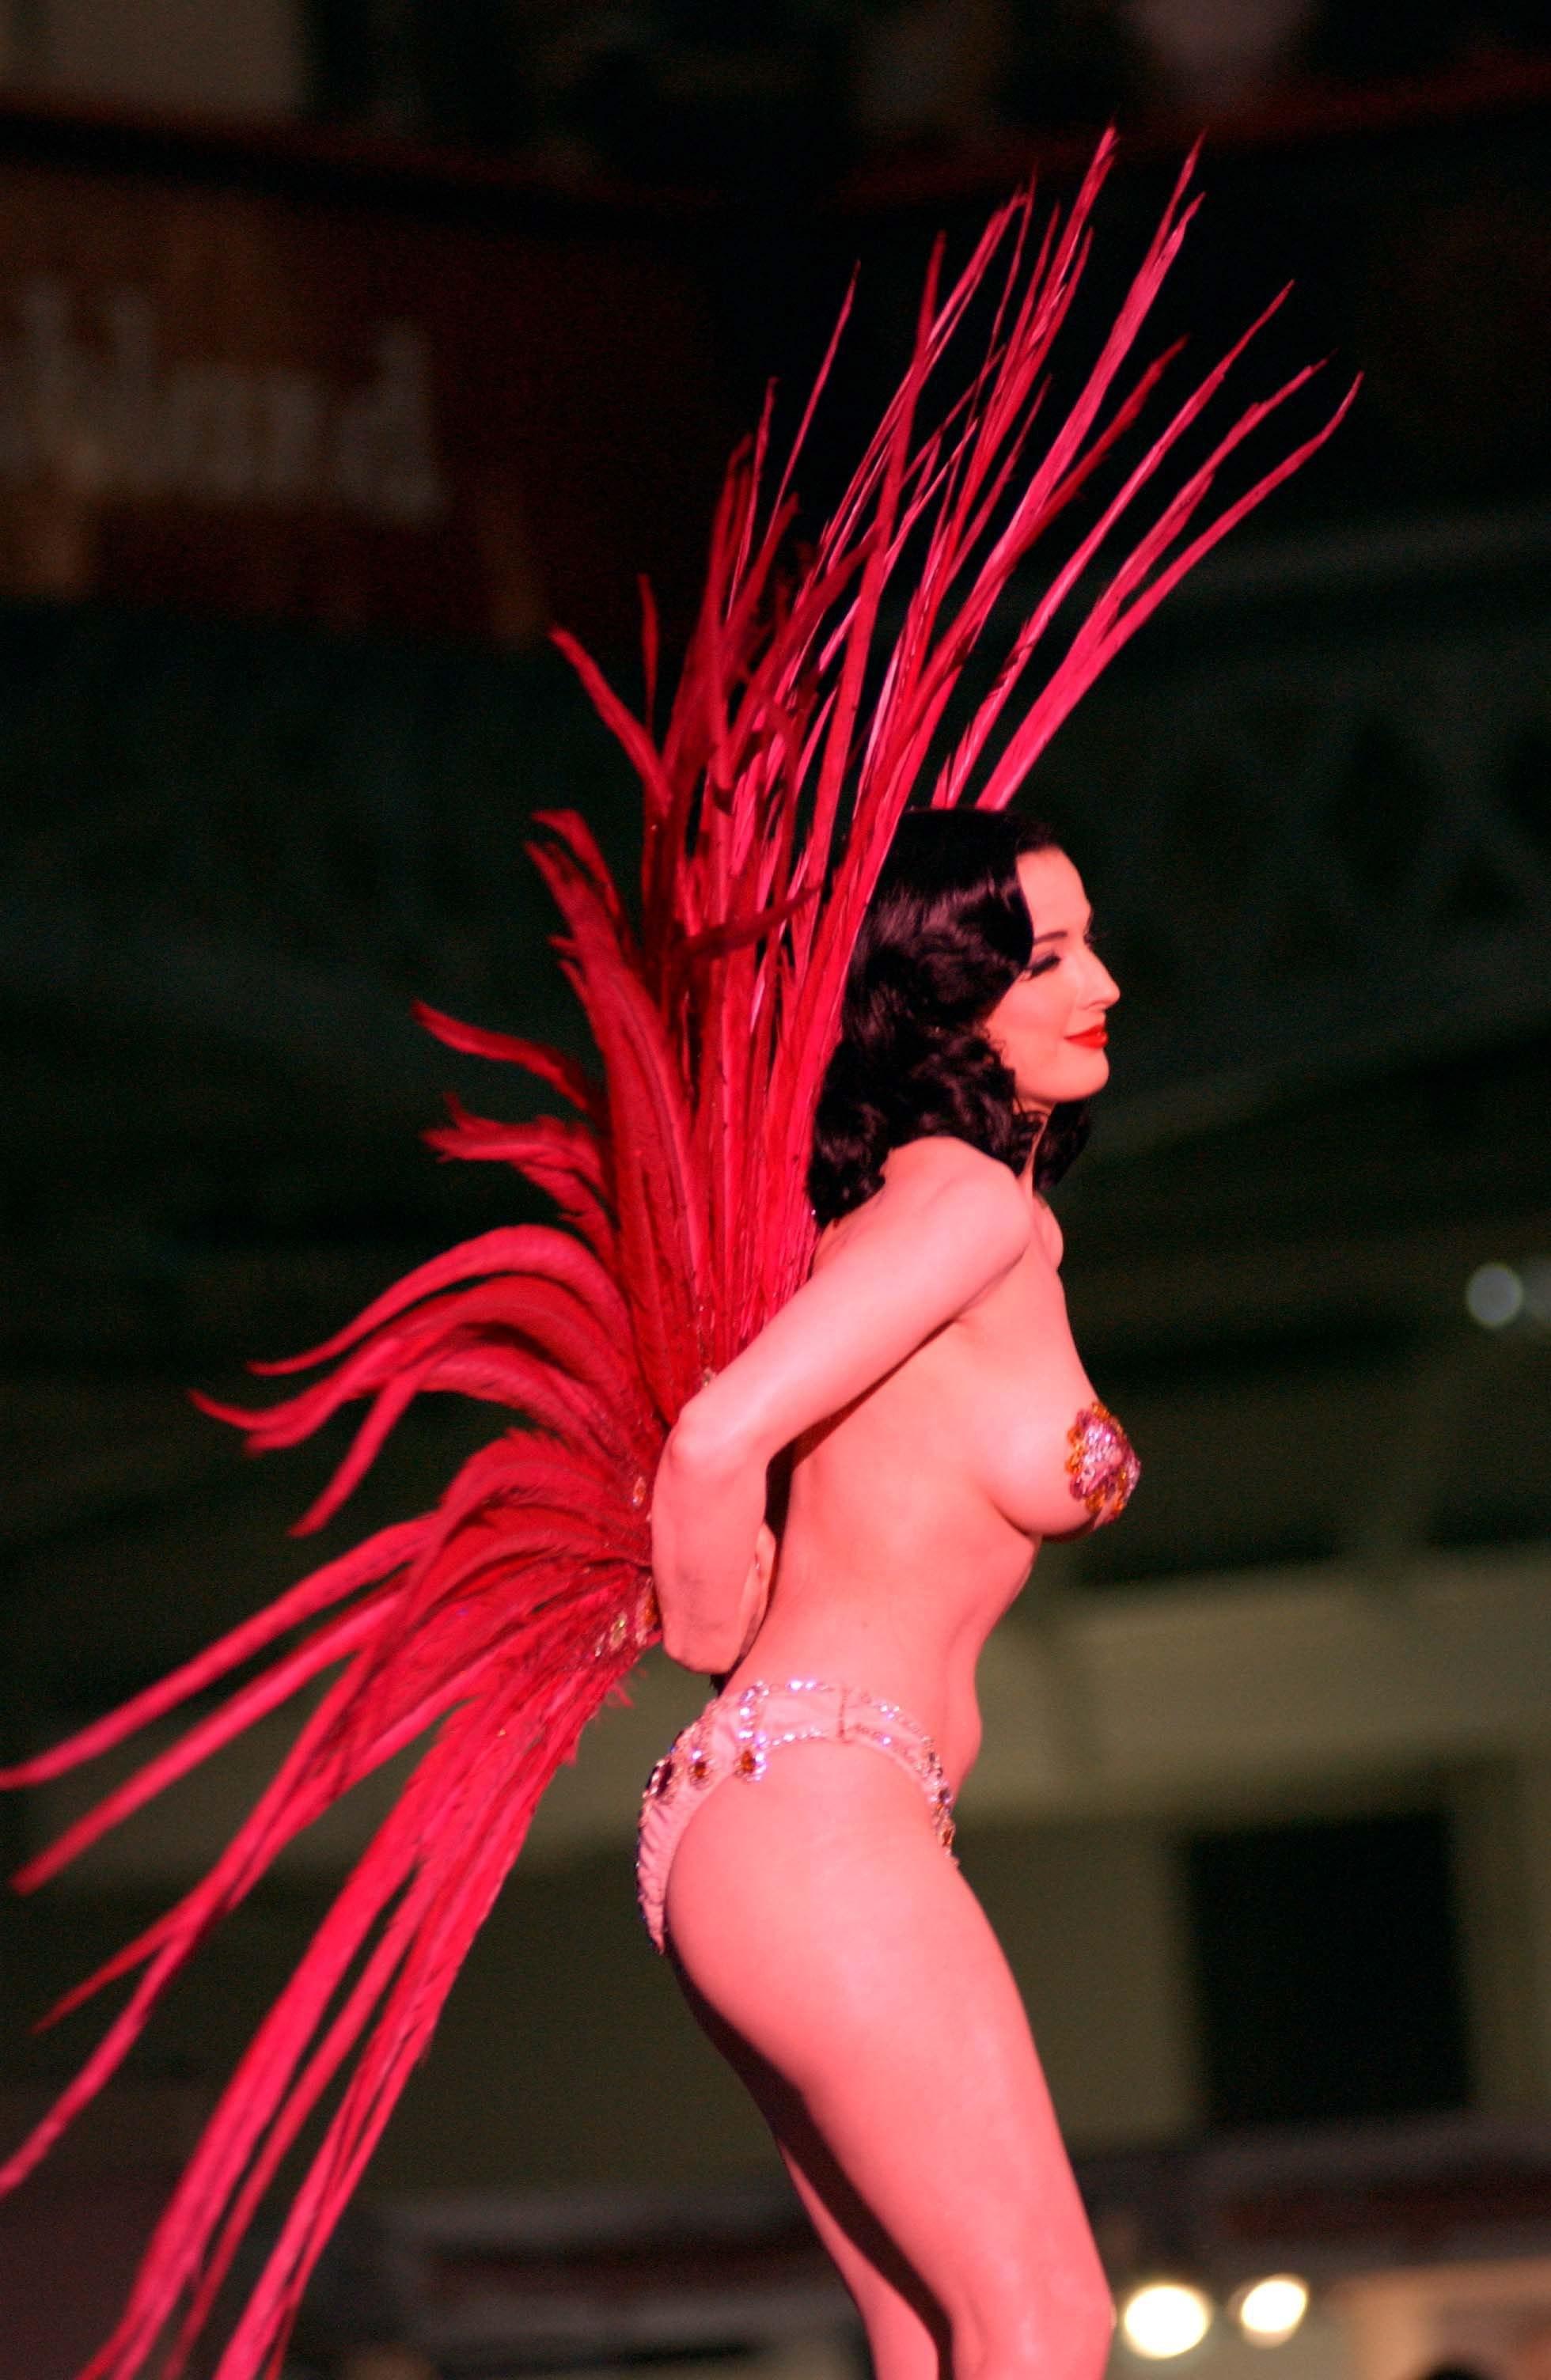 43892_Dita_Von_Teese_performs_on_stage_at_Erotica_2007_celebutopia_231107_02_123_554lo.jpg